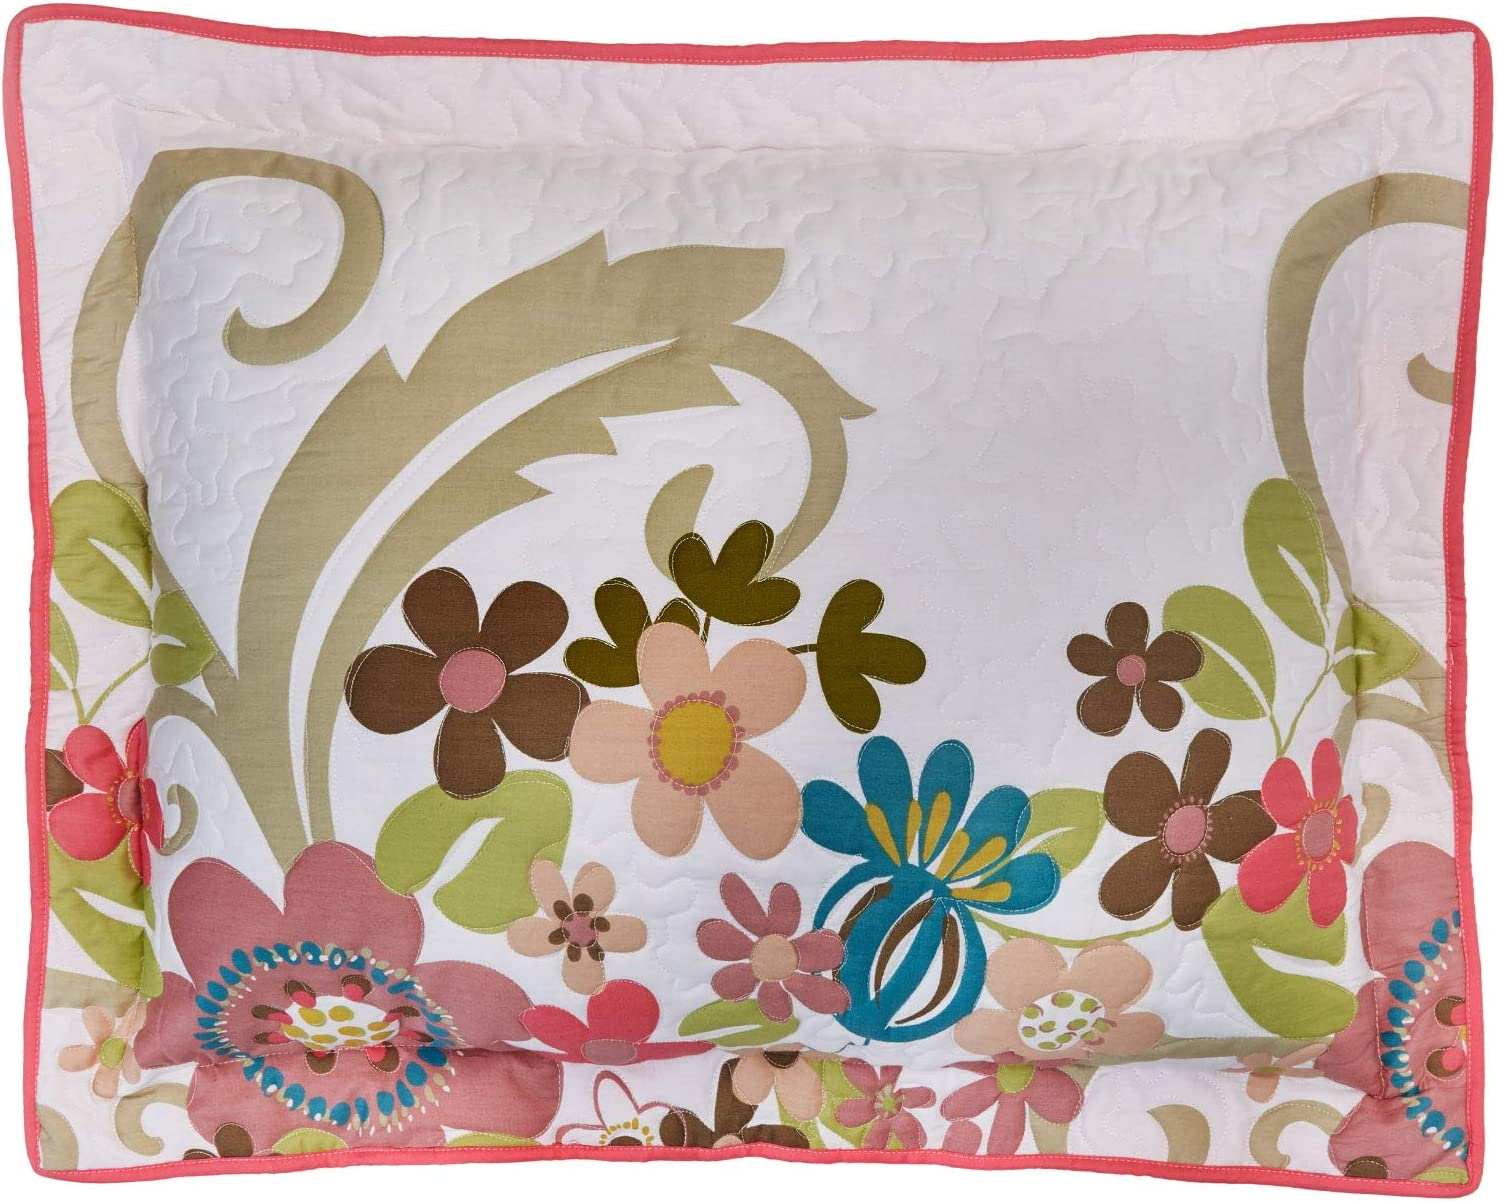 BrylaneHome Jardin Floral Sham - King, White Pink